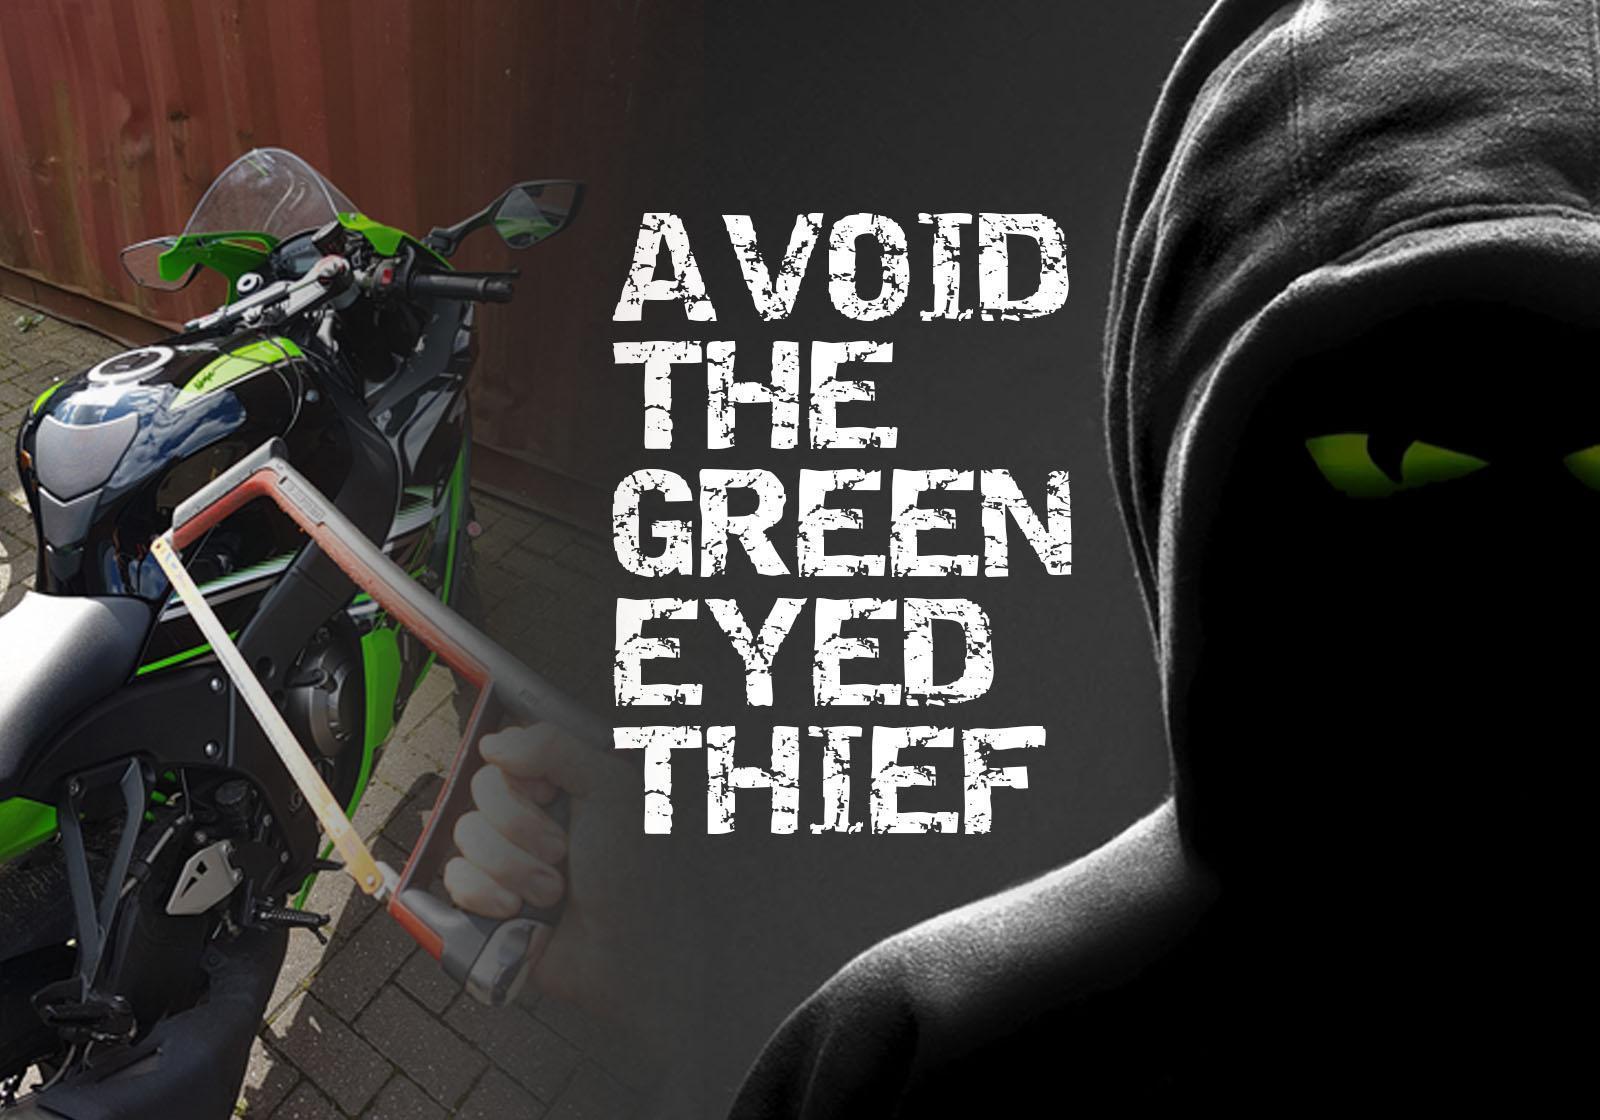 Advice for keeping your Kawasaki safe